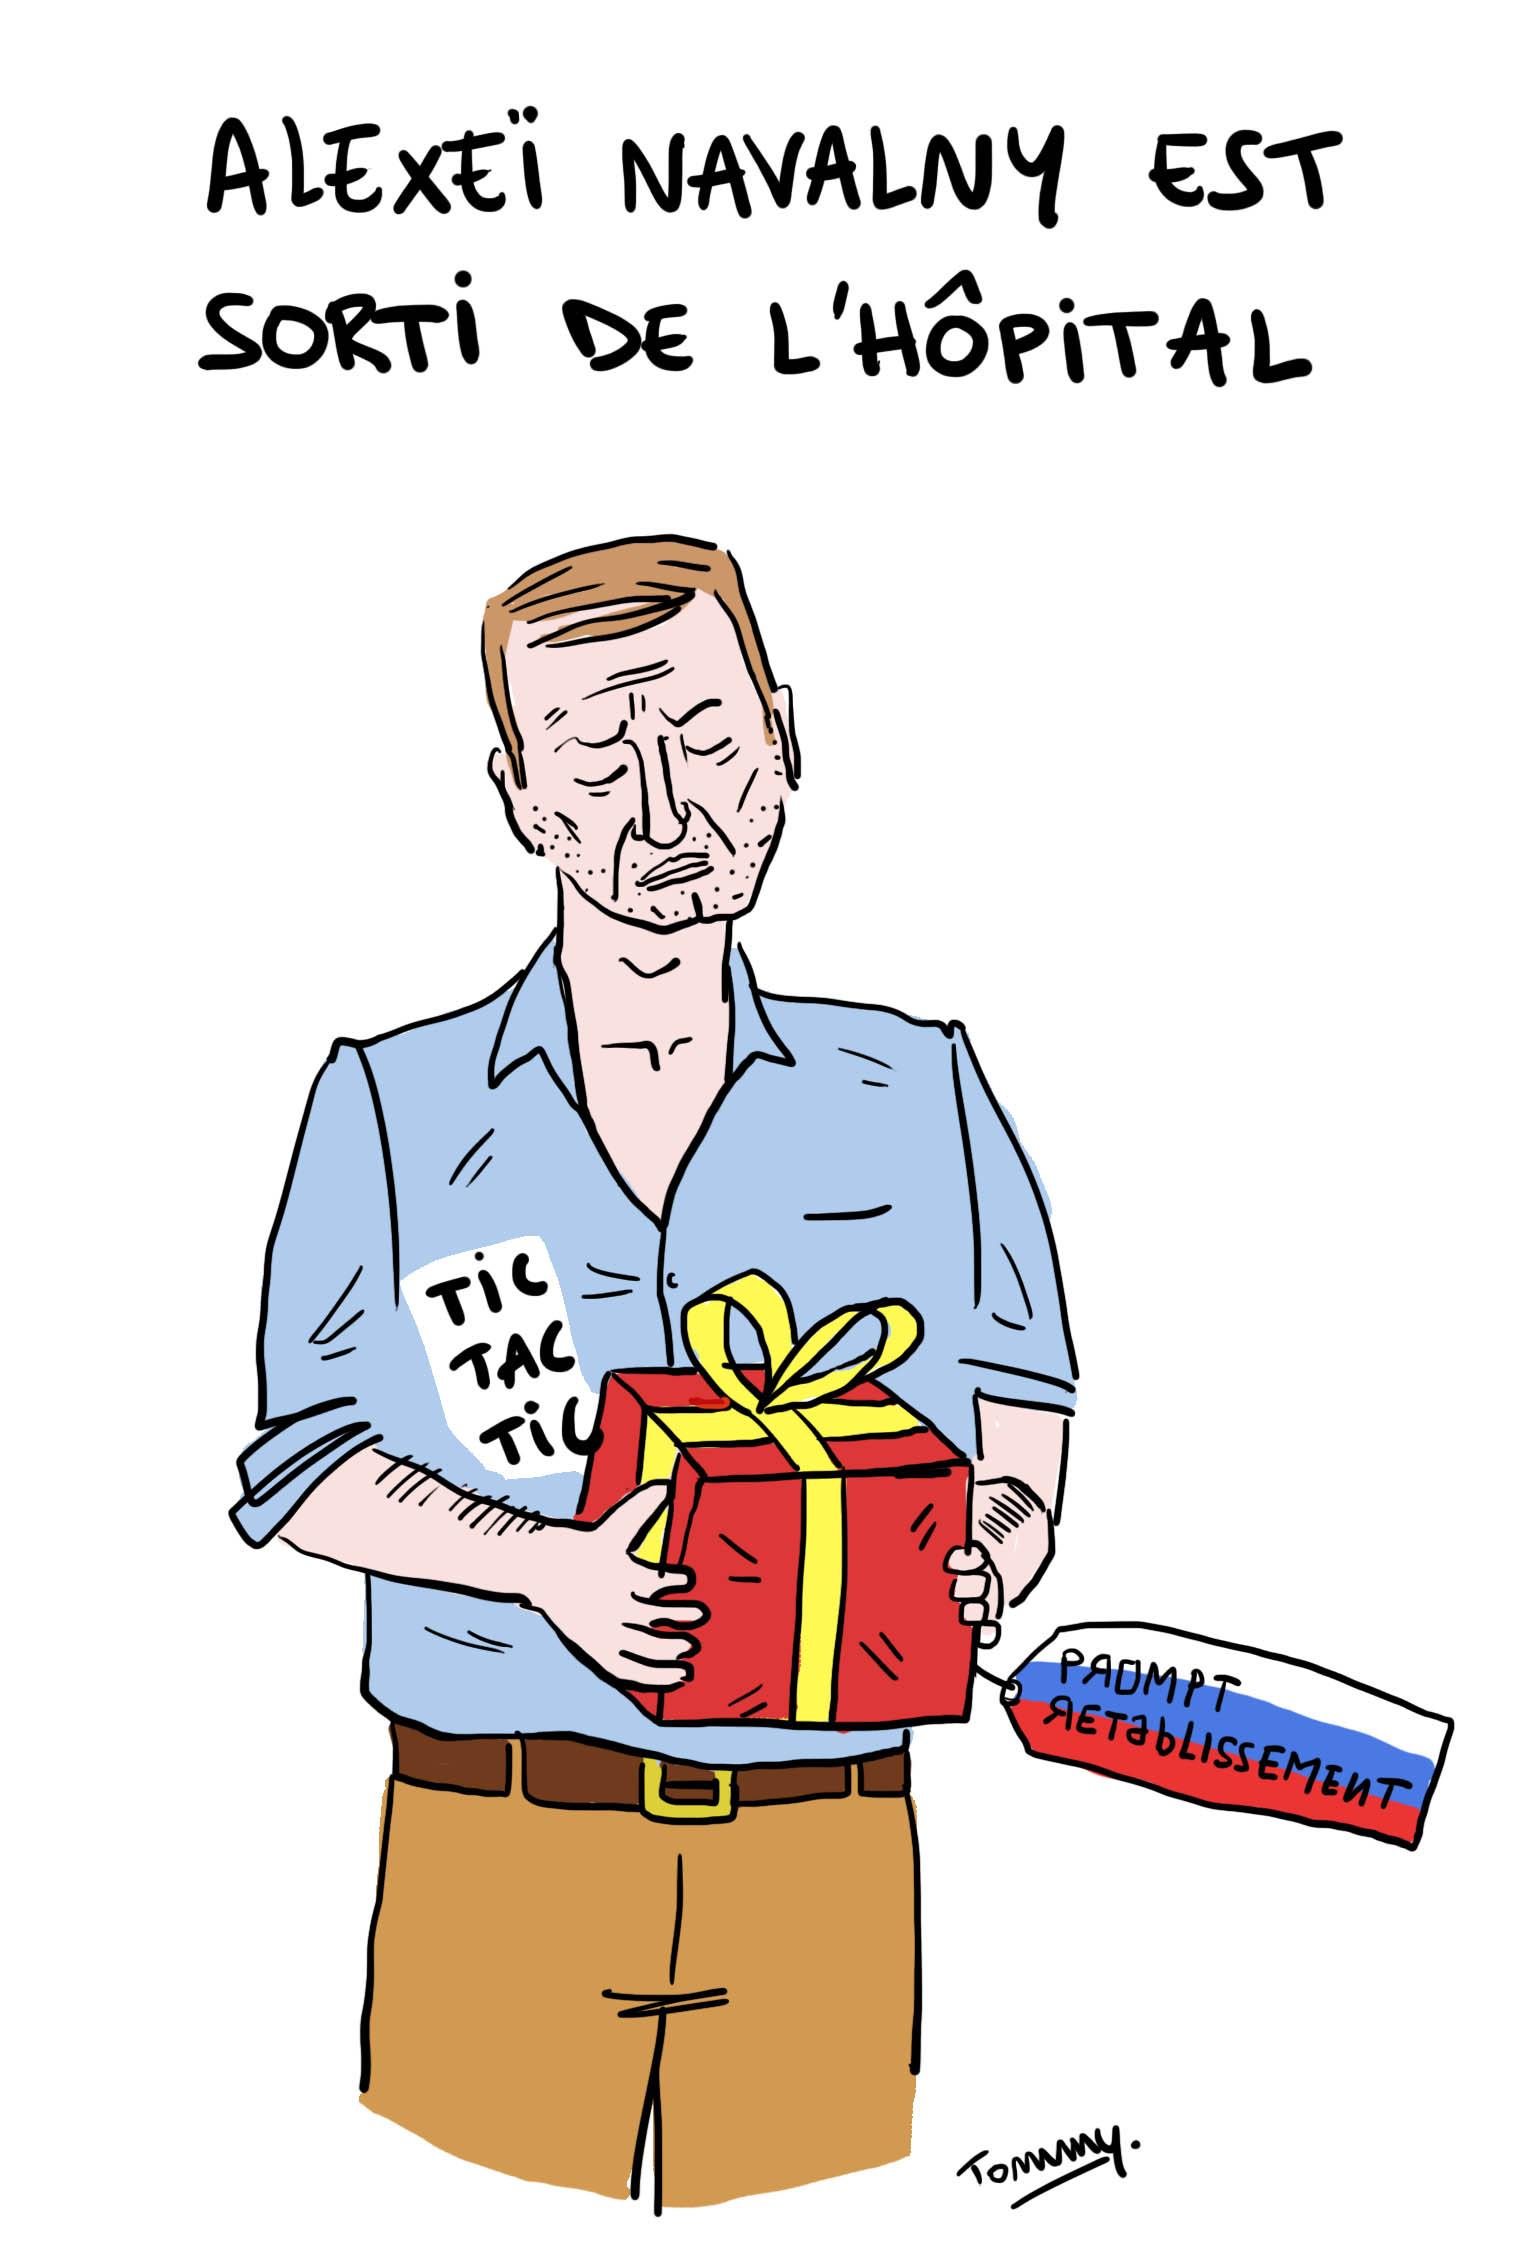 Navalny sorti de l'hôpital